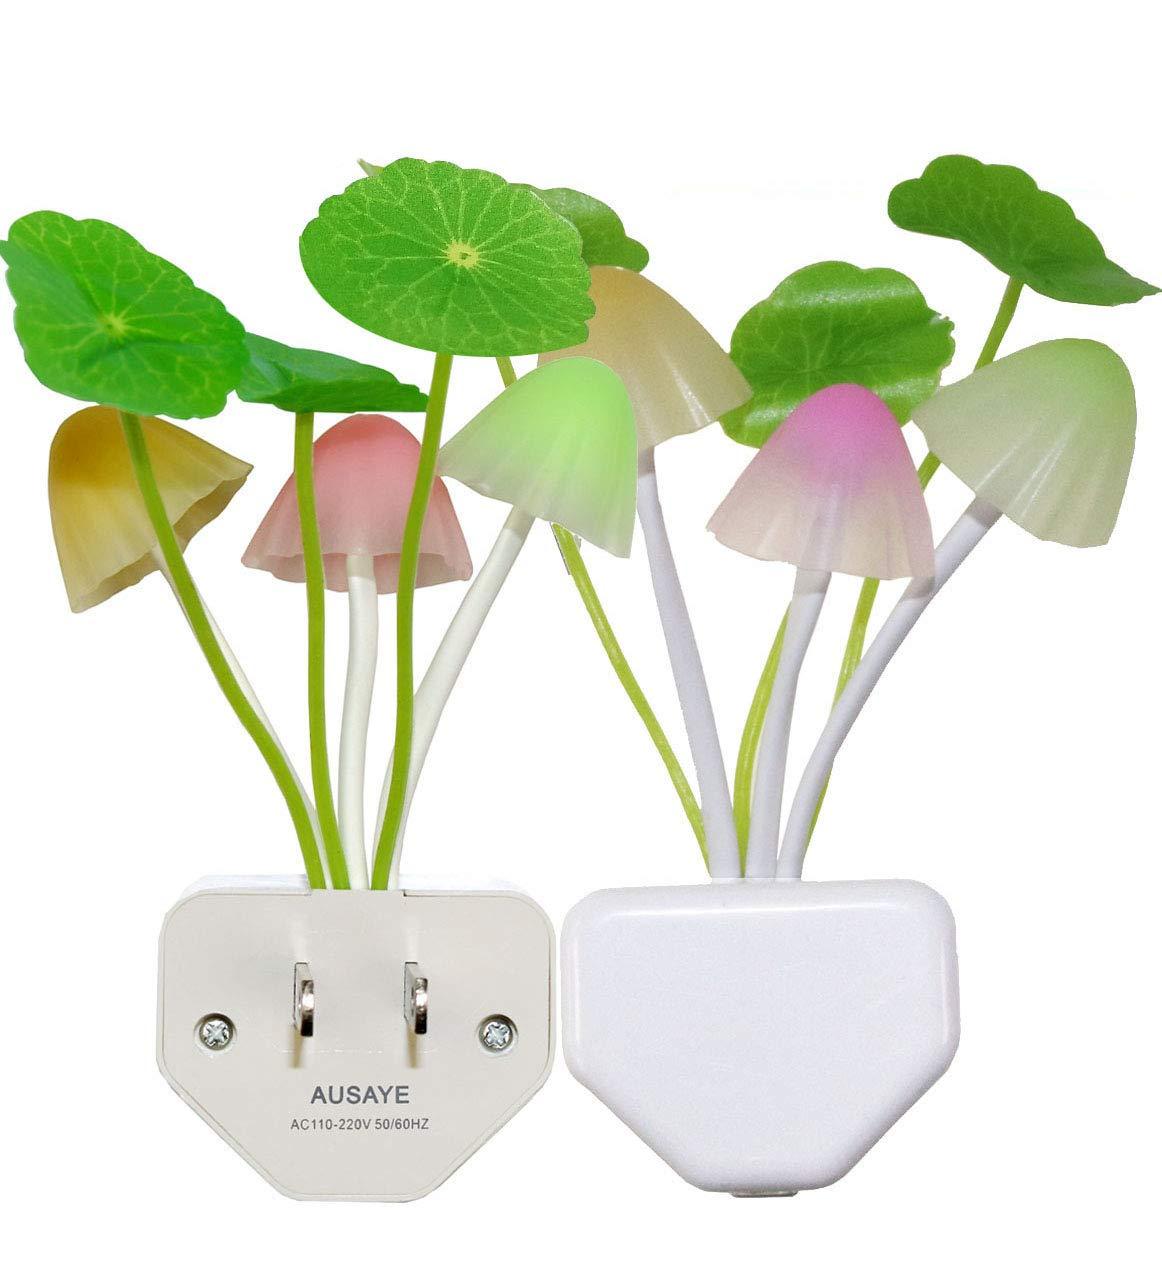 2 Pack Led Night Light w/Dusk to Dawn Sensor,AUSAYE 0.6W Plug-in Night Light Lamp